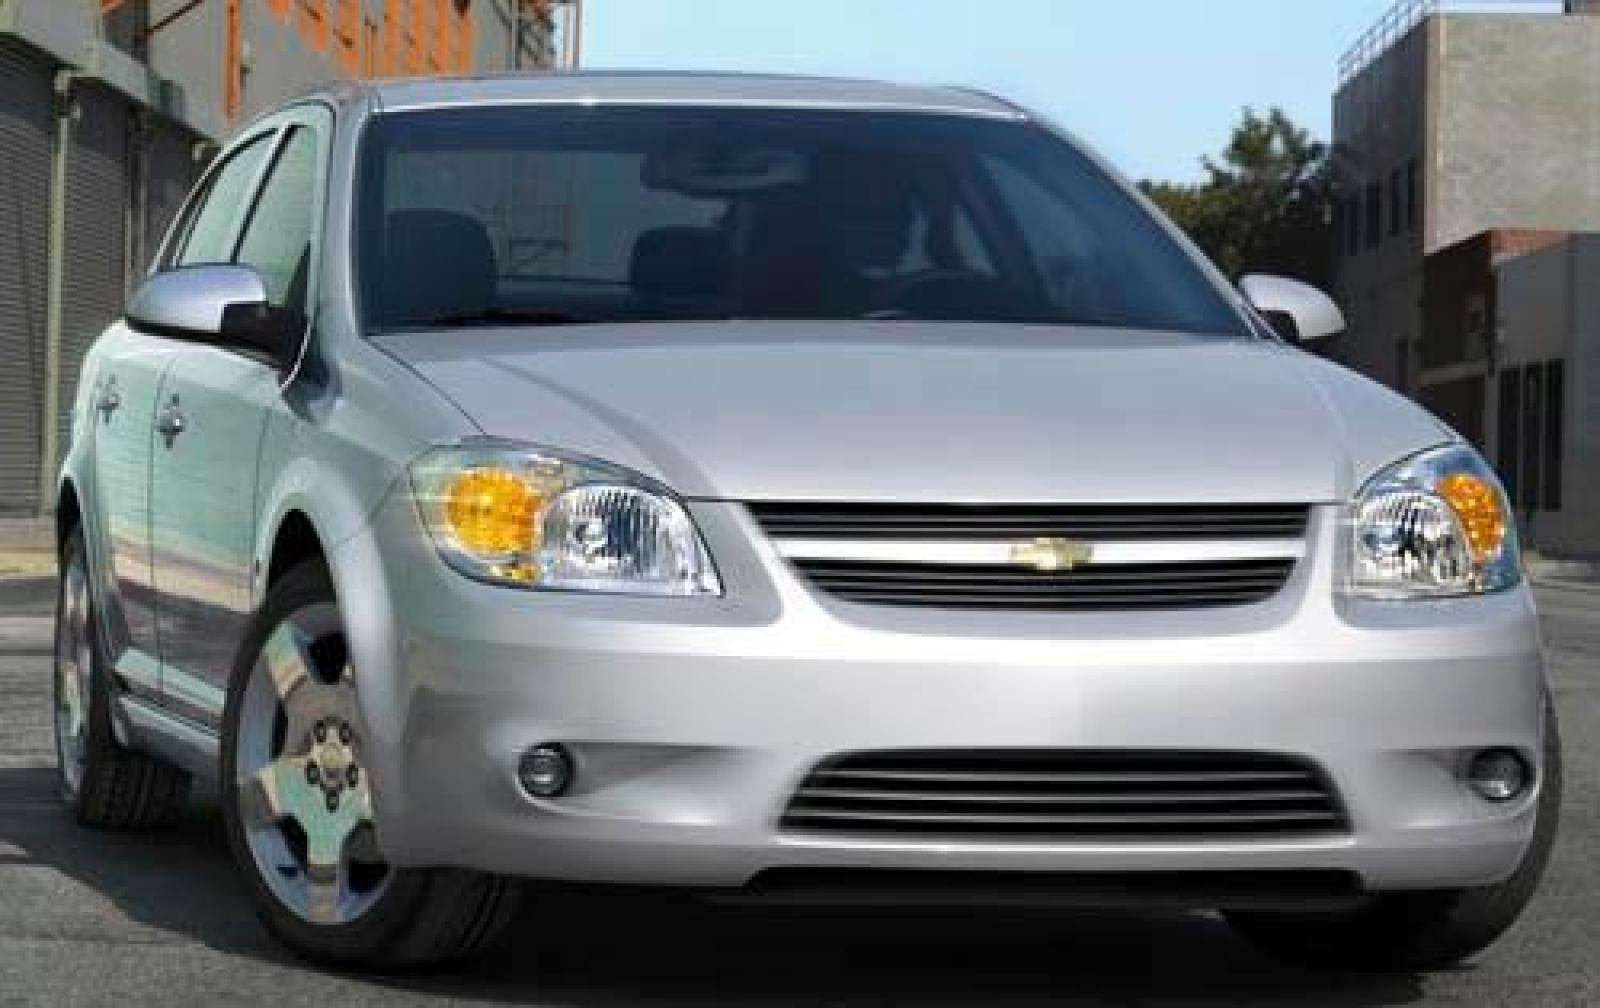 2010 Chevrolet Cobalt Information And Photos Zombiedrive Chevy 2 Engine Diagram 800 1024 1280 1600 Origin